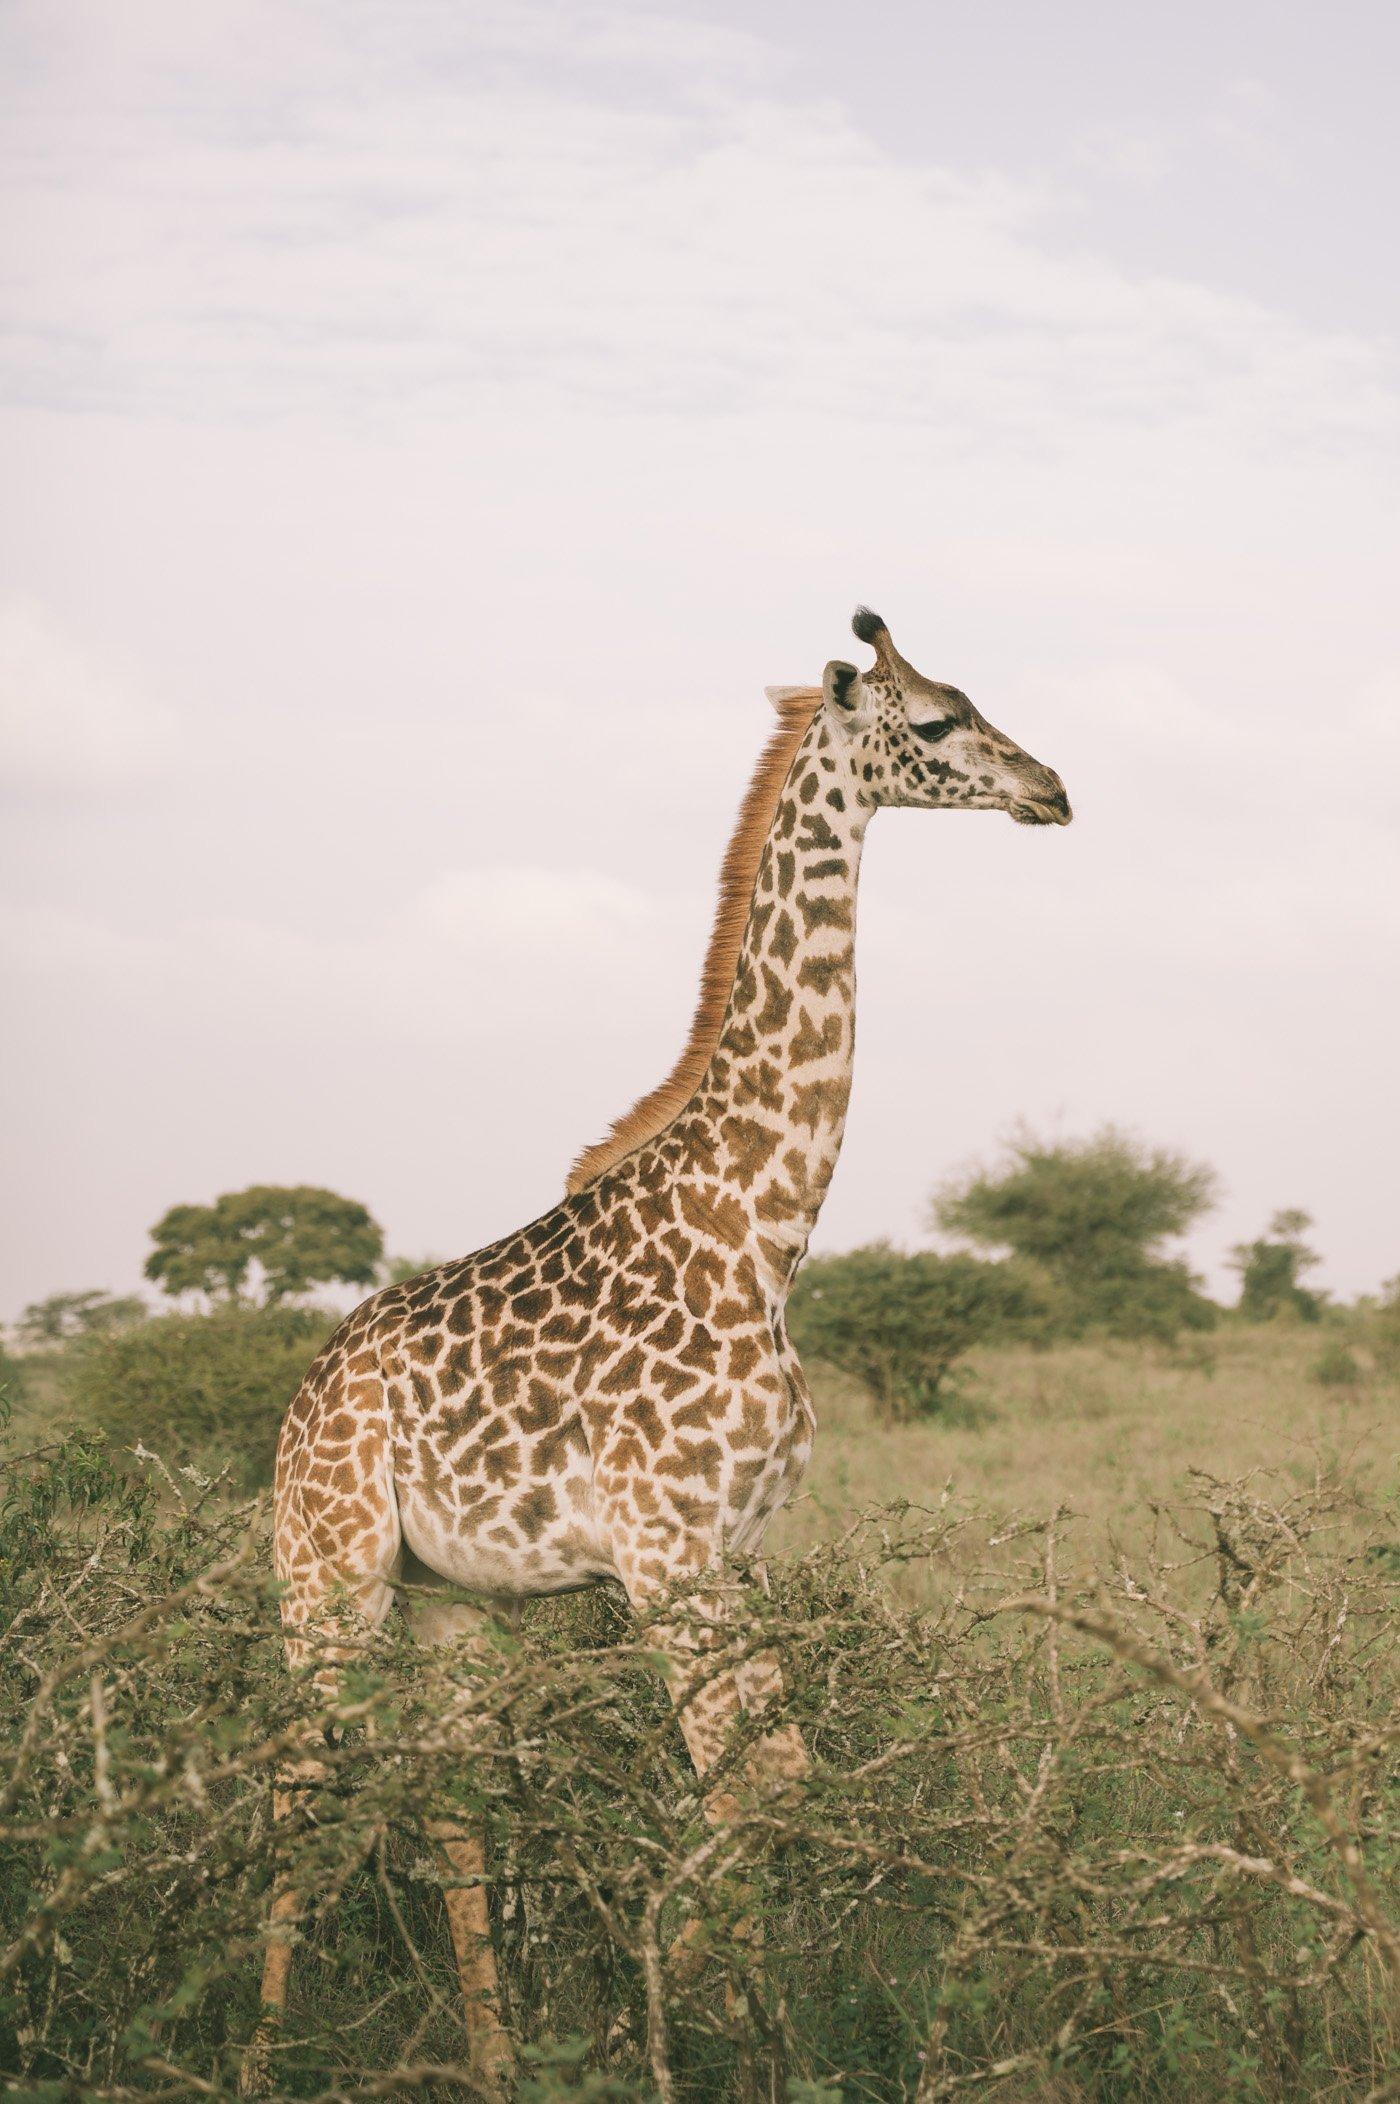 Giraffe at Nairobi National Park Kenya